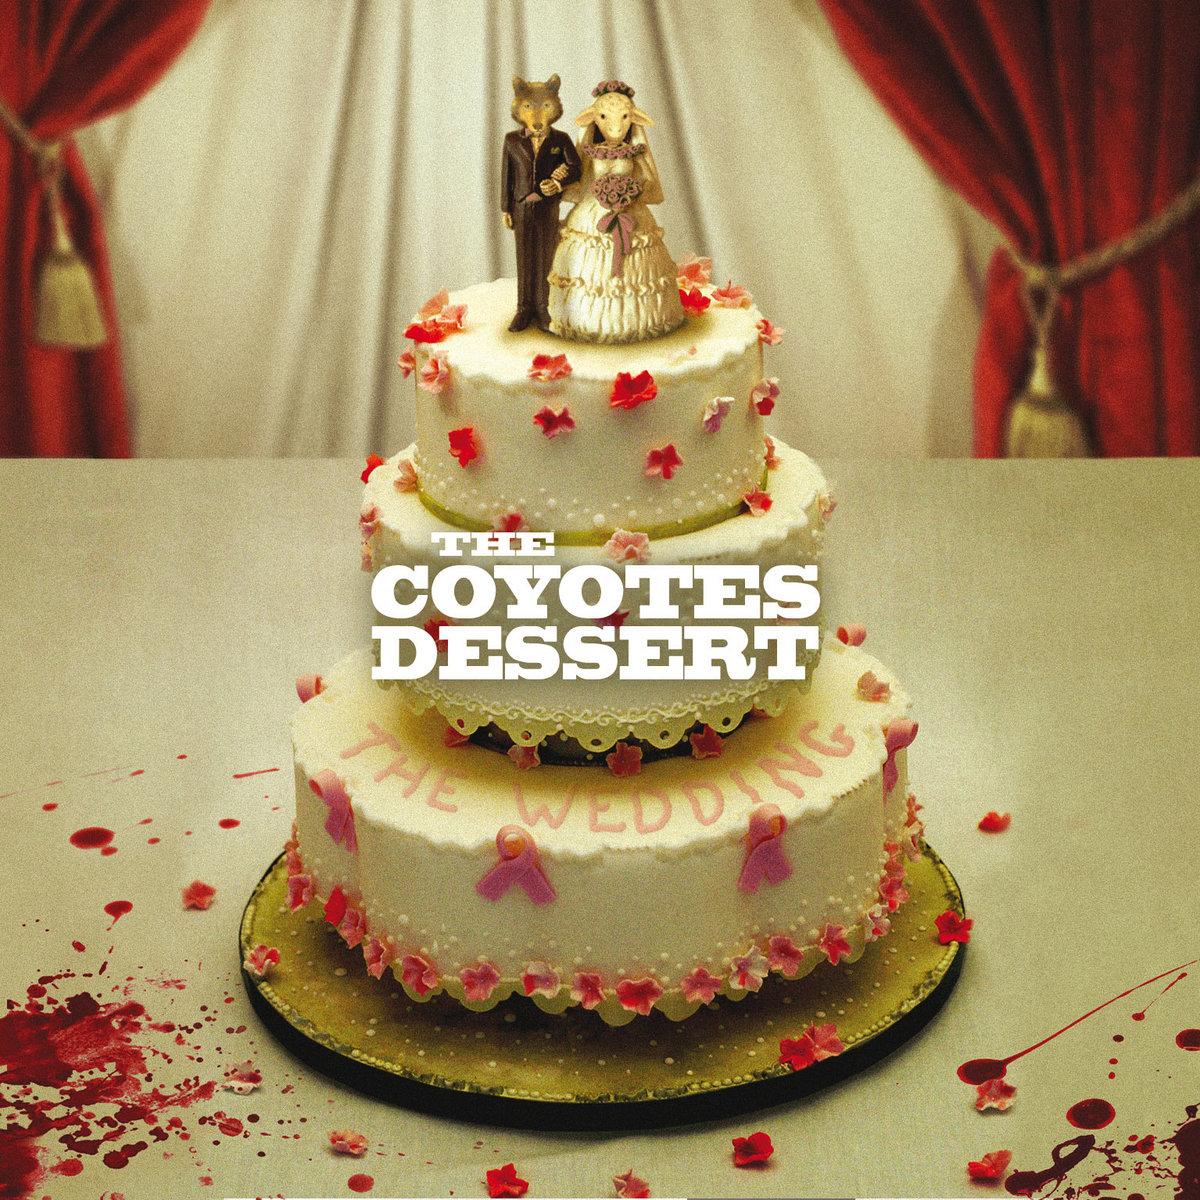 The Coyotes Dessert